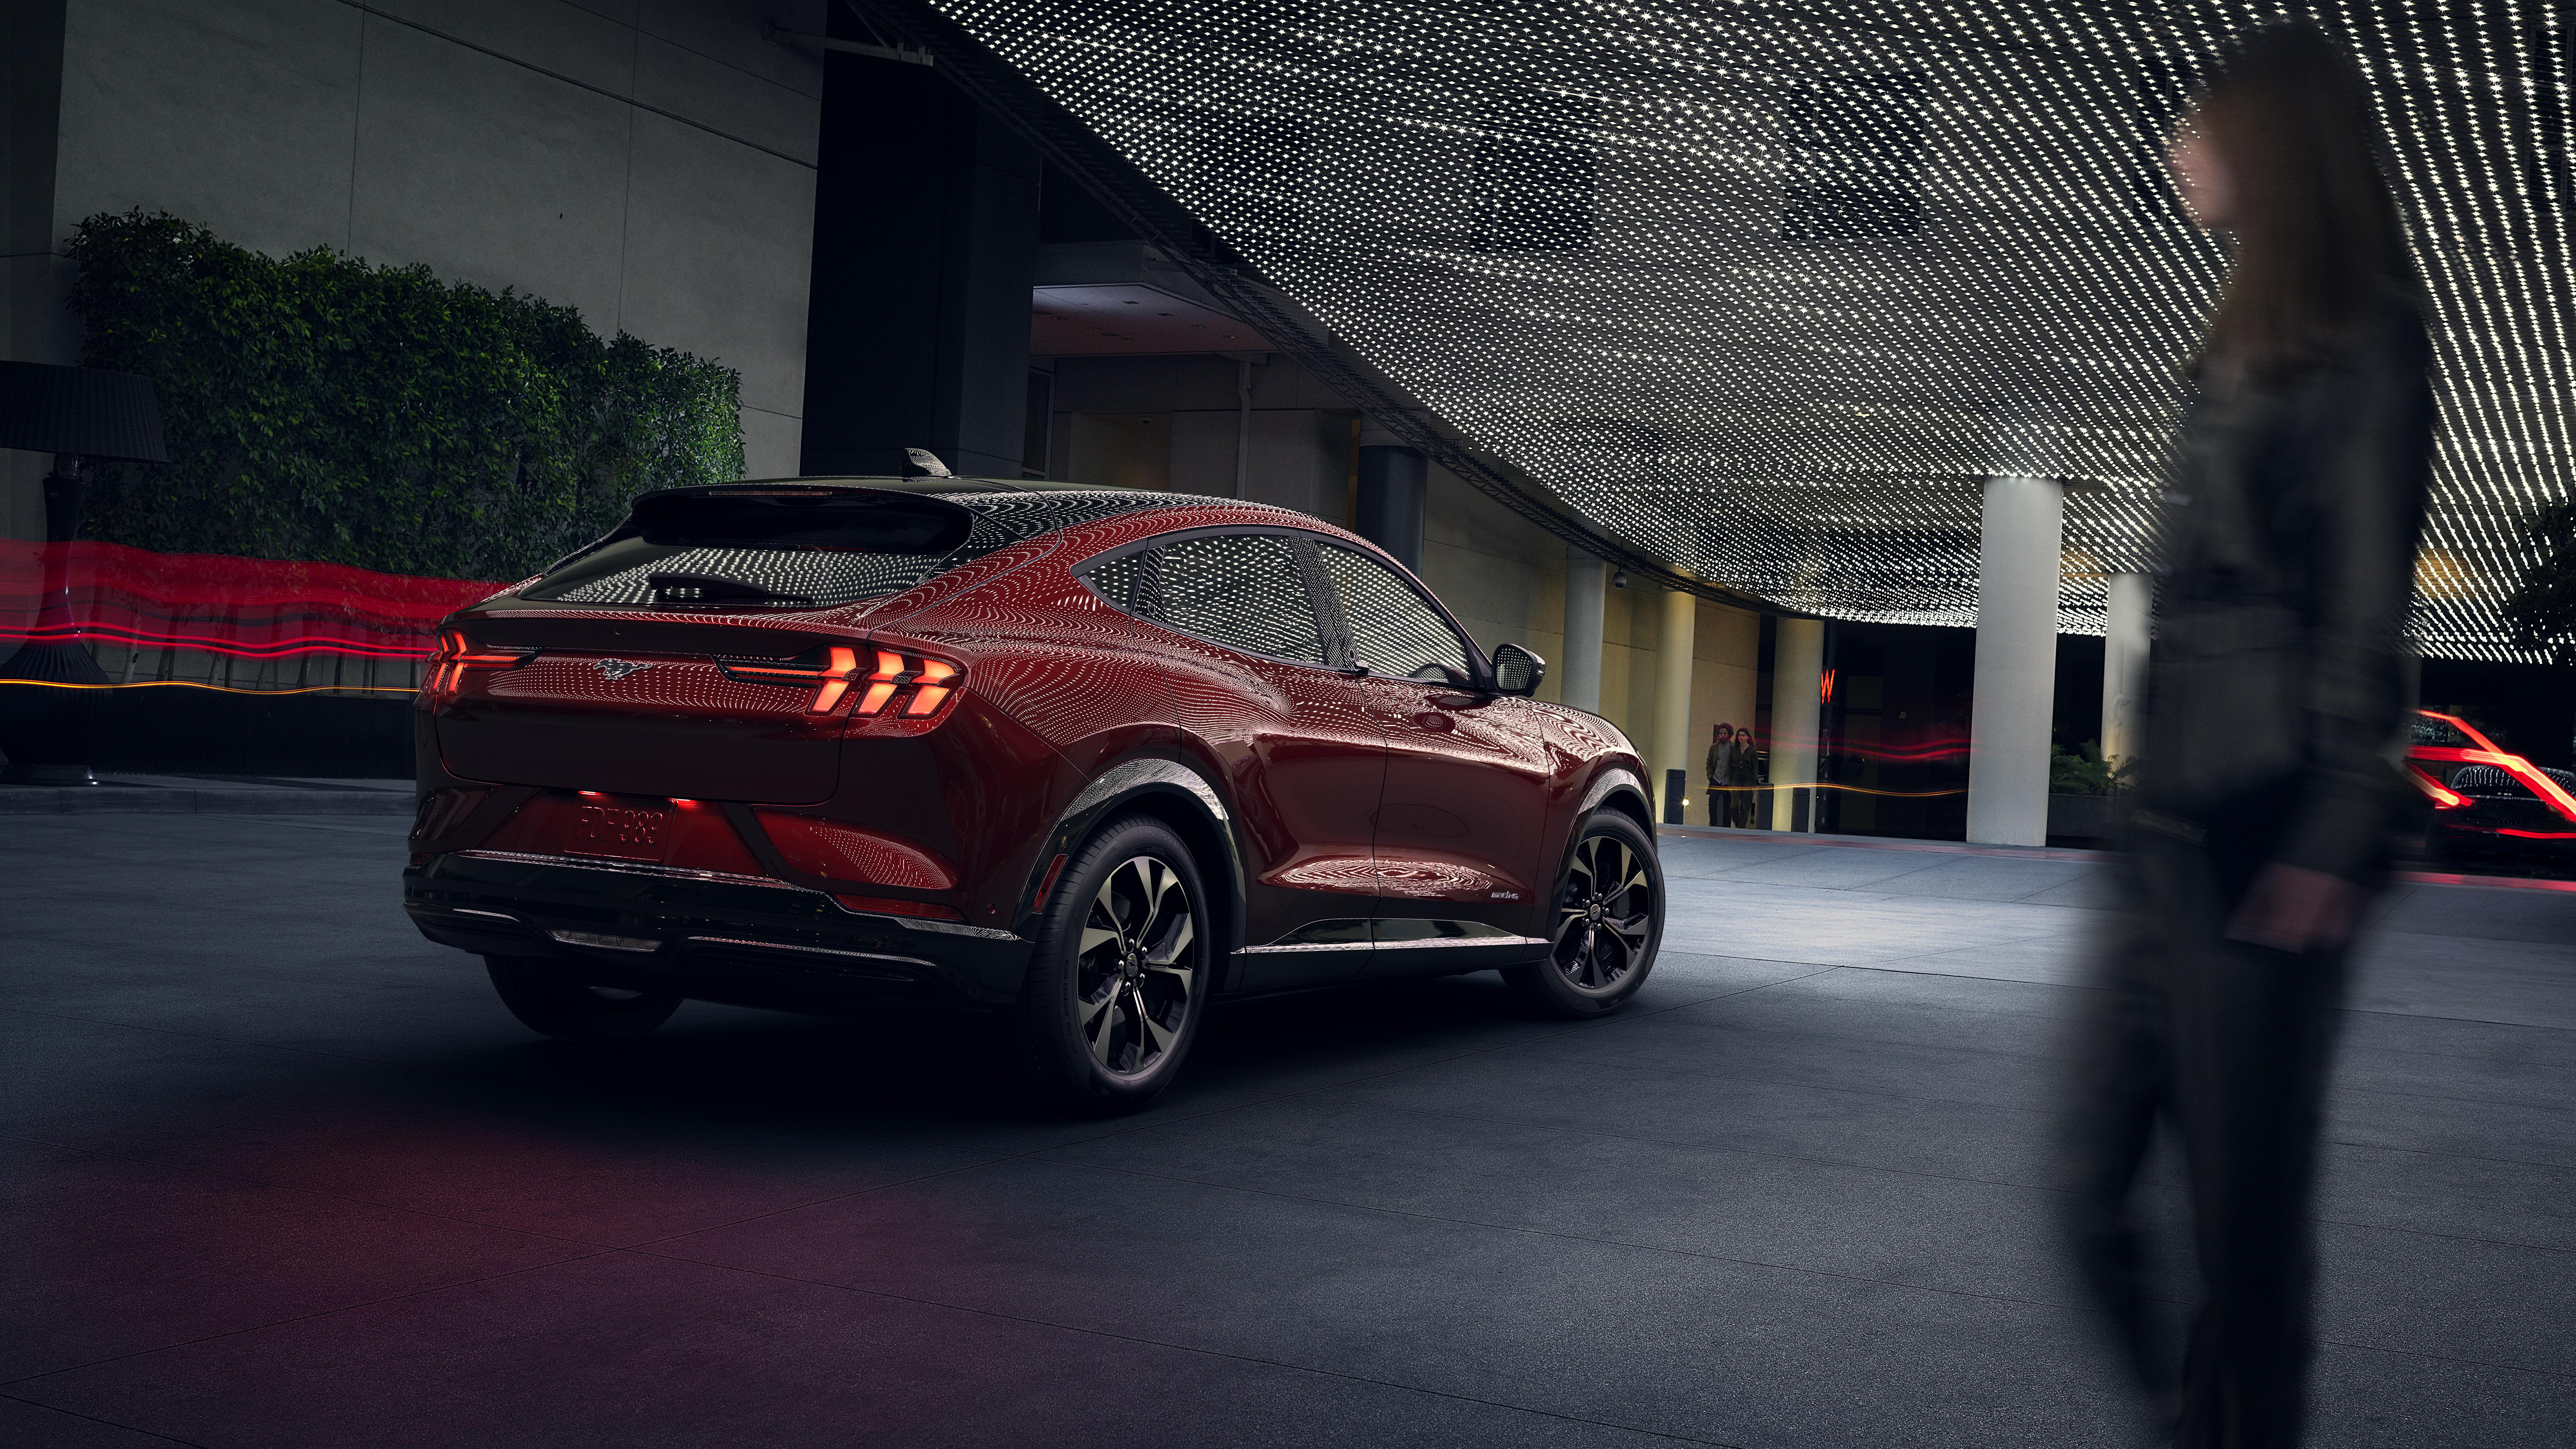 2021 Ford Mustang Mach E 5k 2 Wallpaper Hd Car Wallpapers Id 13756 2021 ford mustang mach e 5k wallpaper